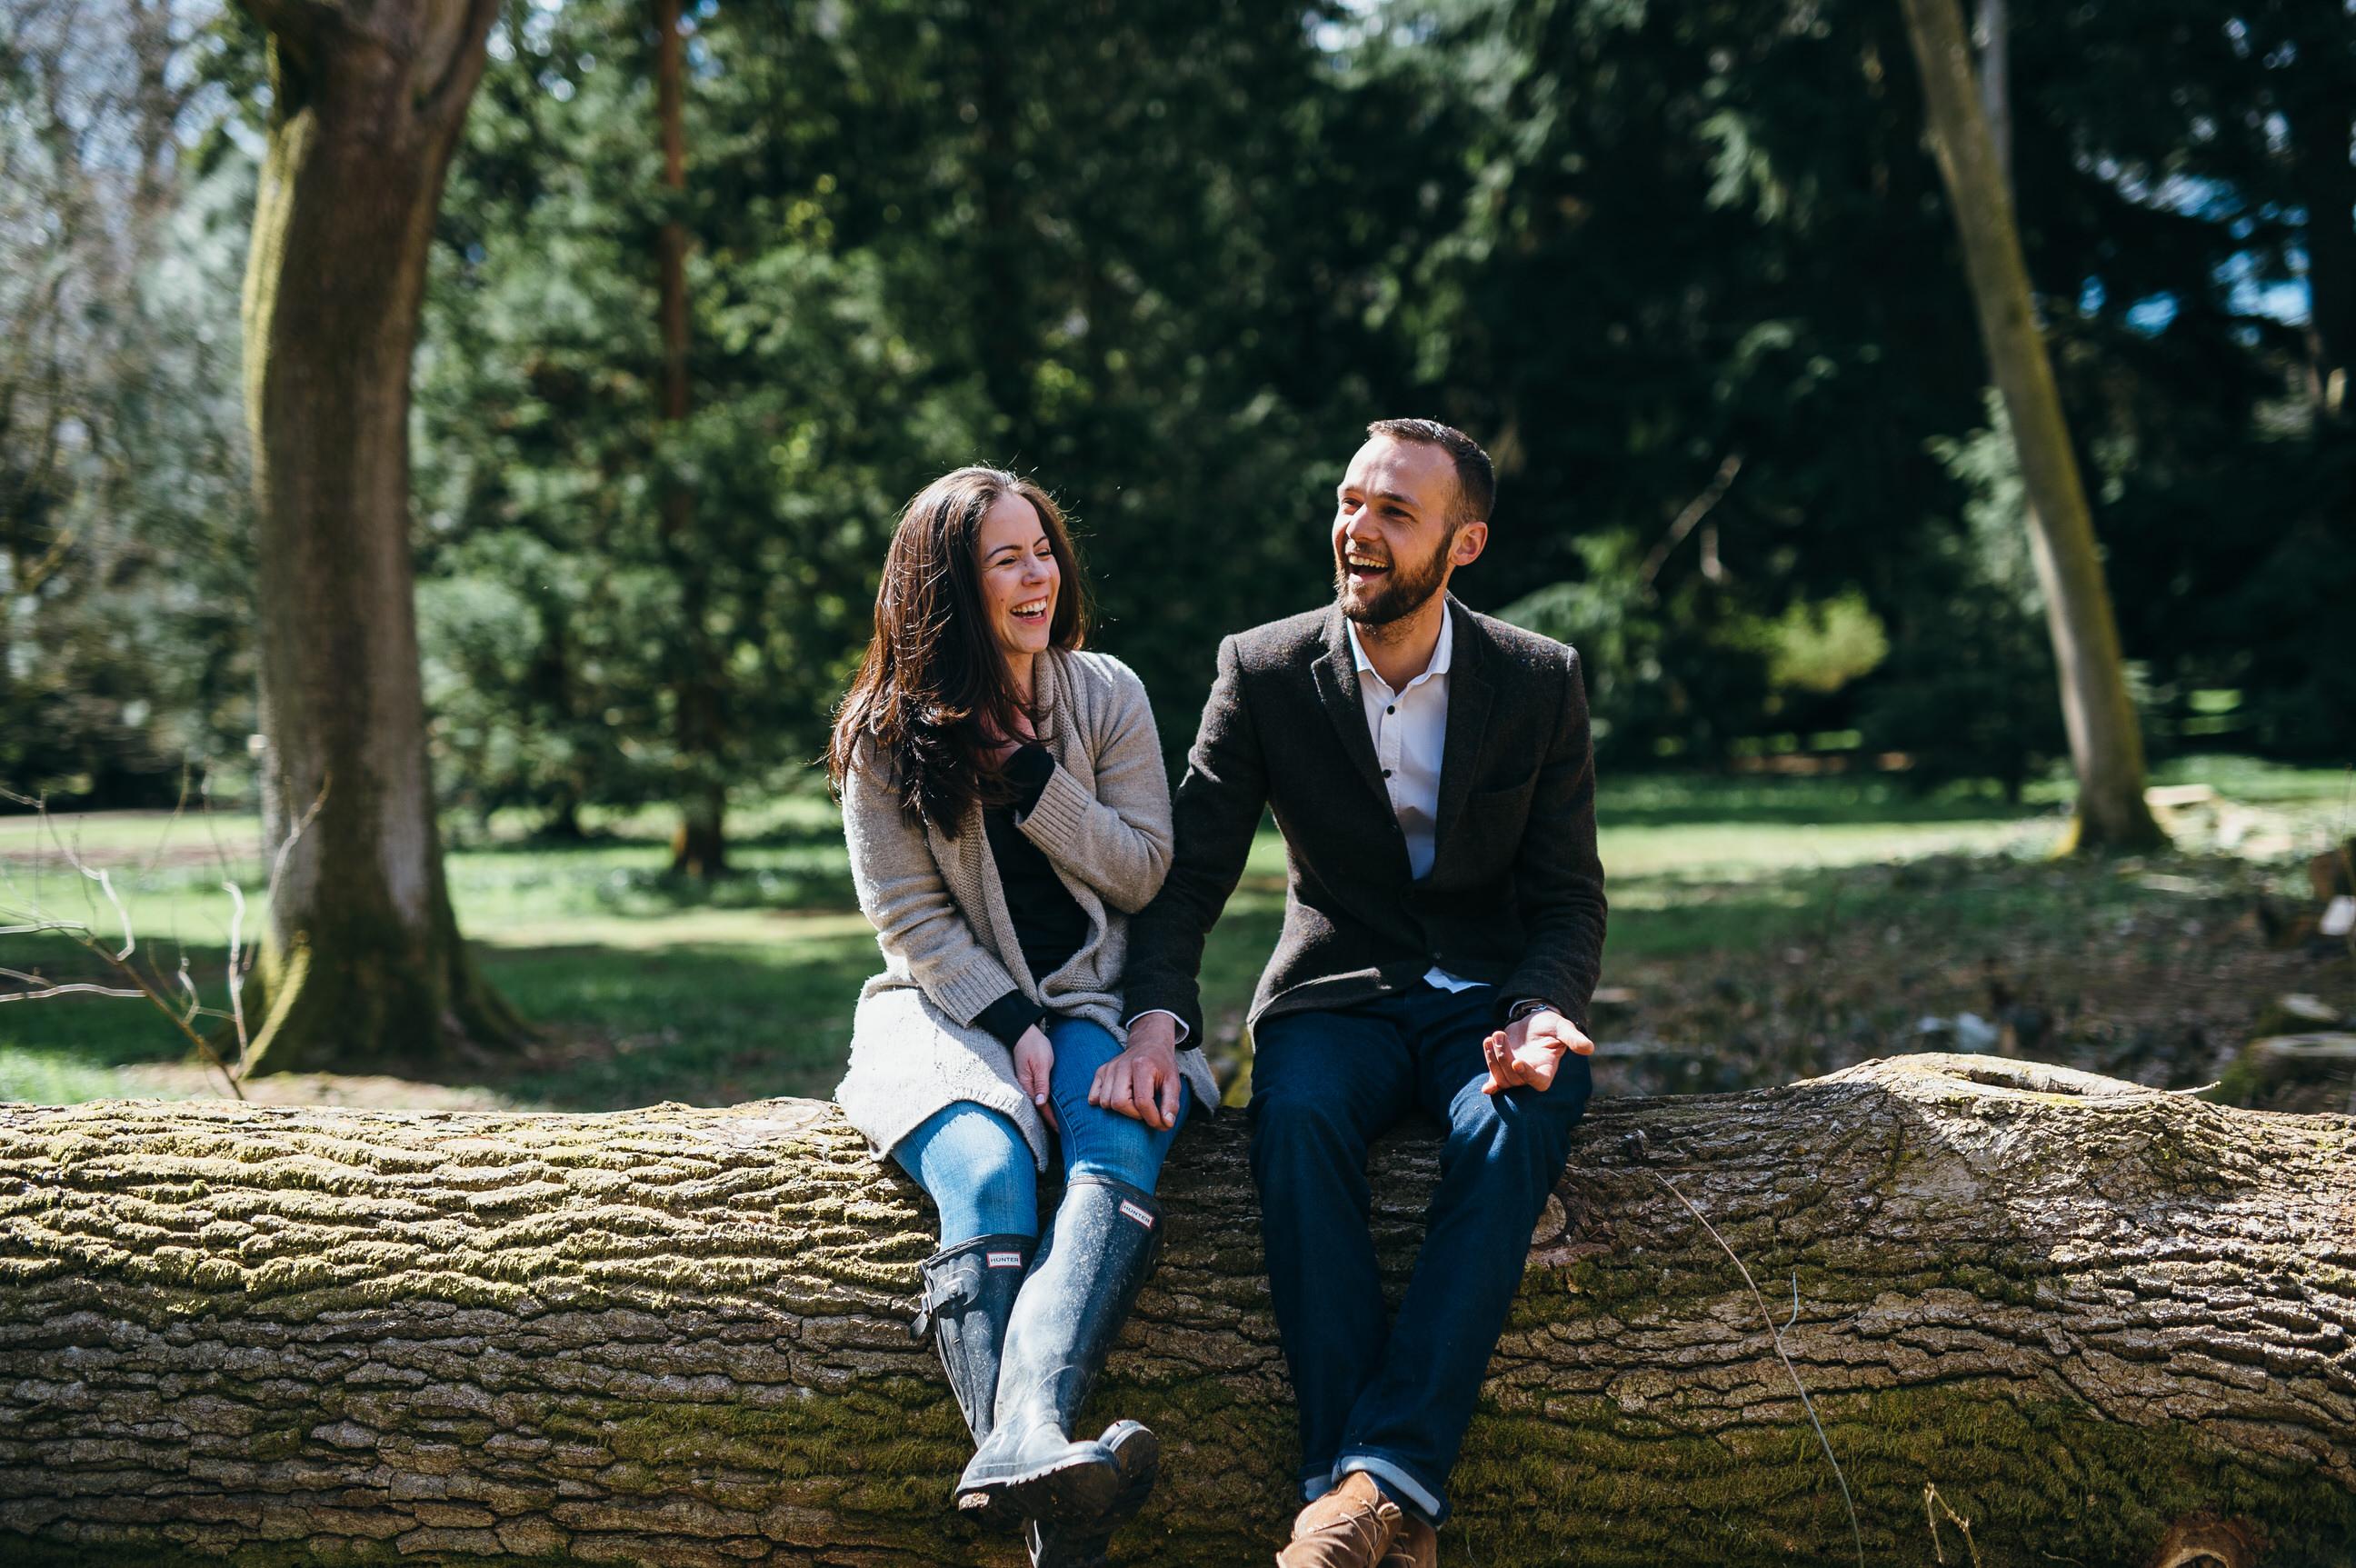 Engagement photographer Somerset